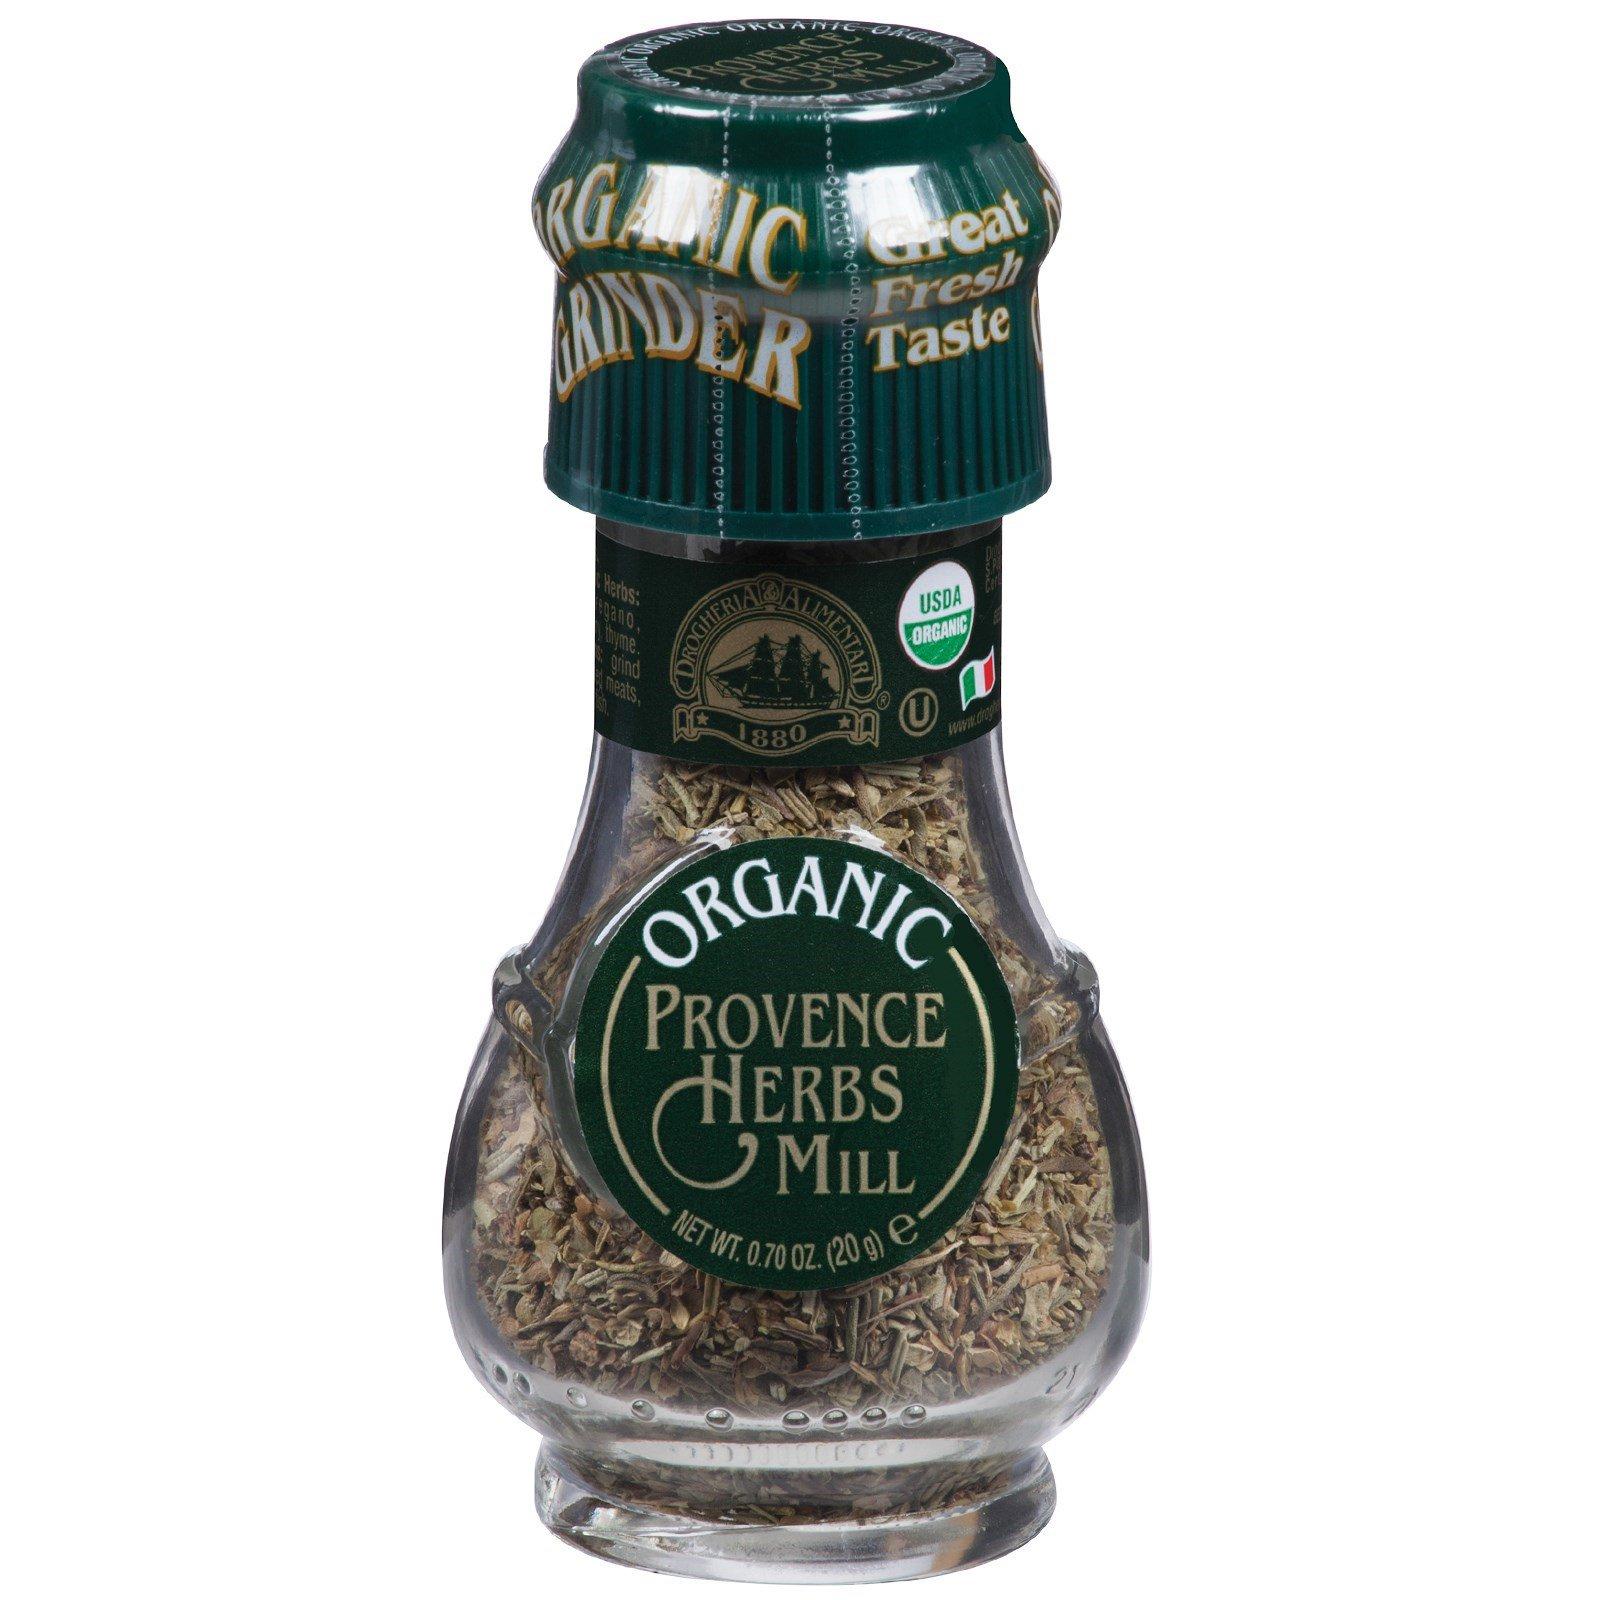 Drogheria & Alimentari, Organic Provence Herbs Blend Mill, 0.71 oz (20 g)